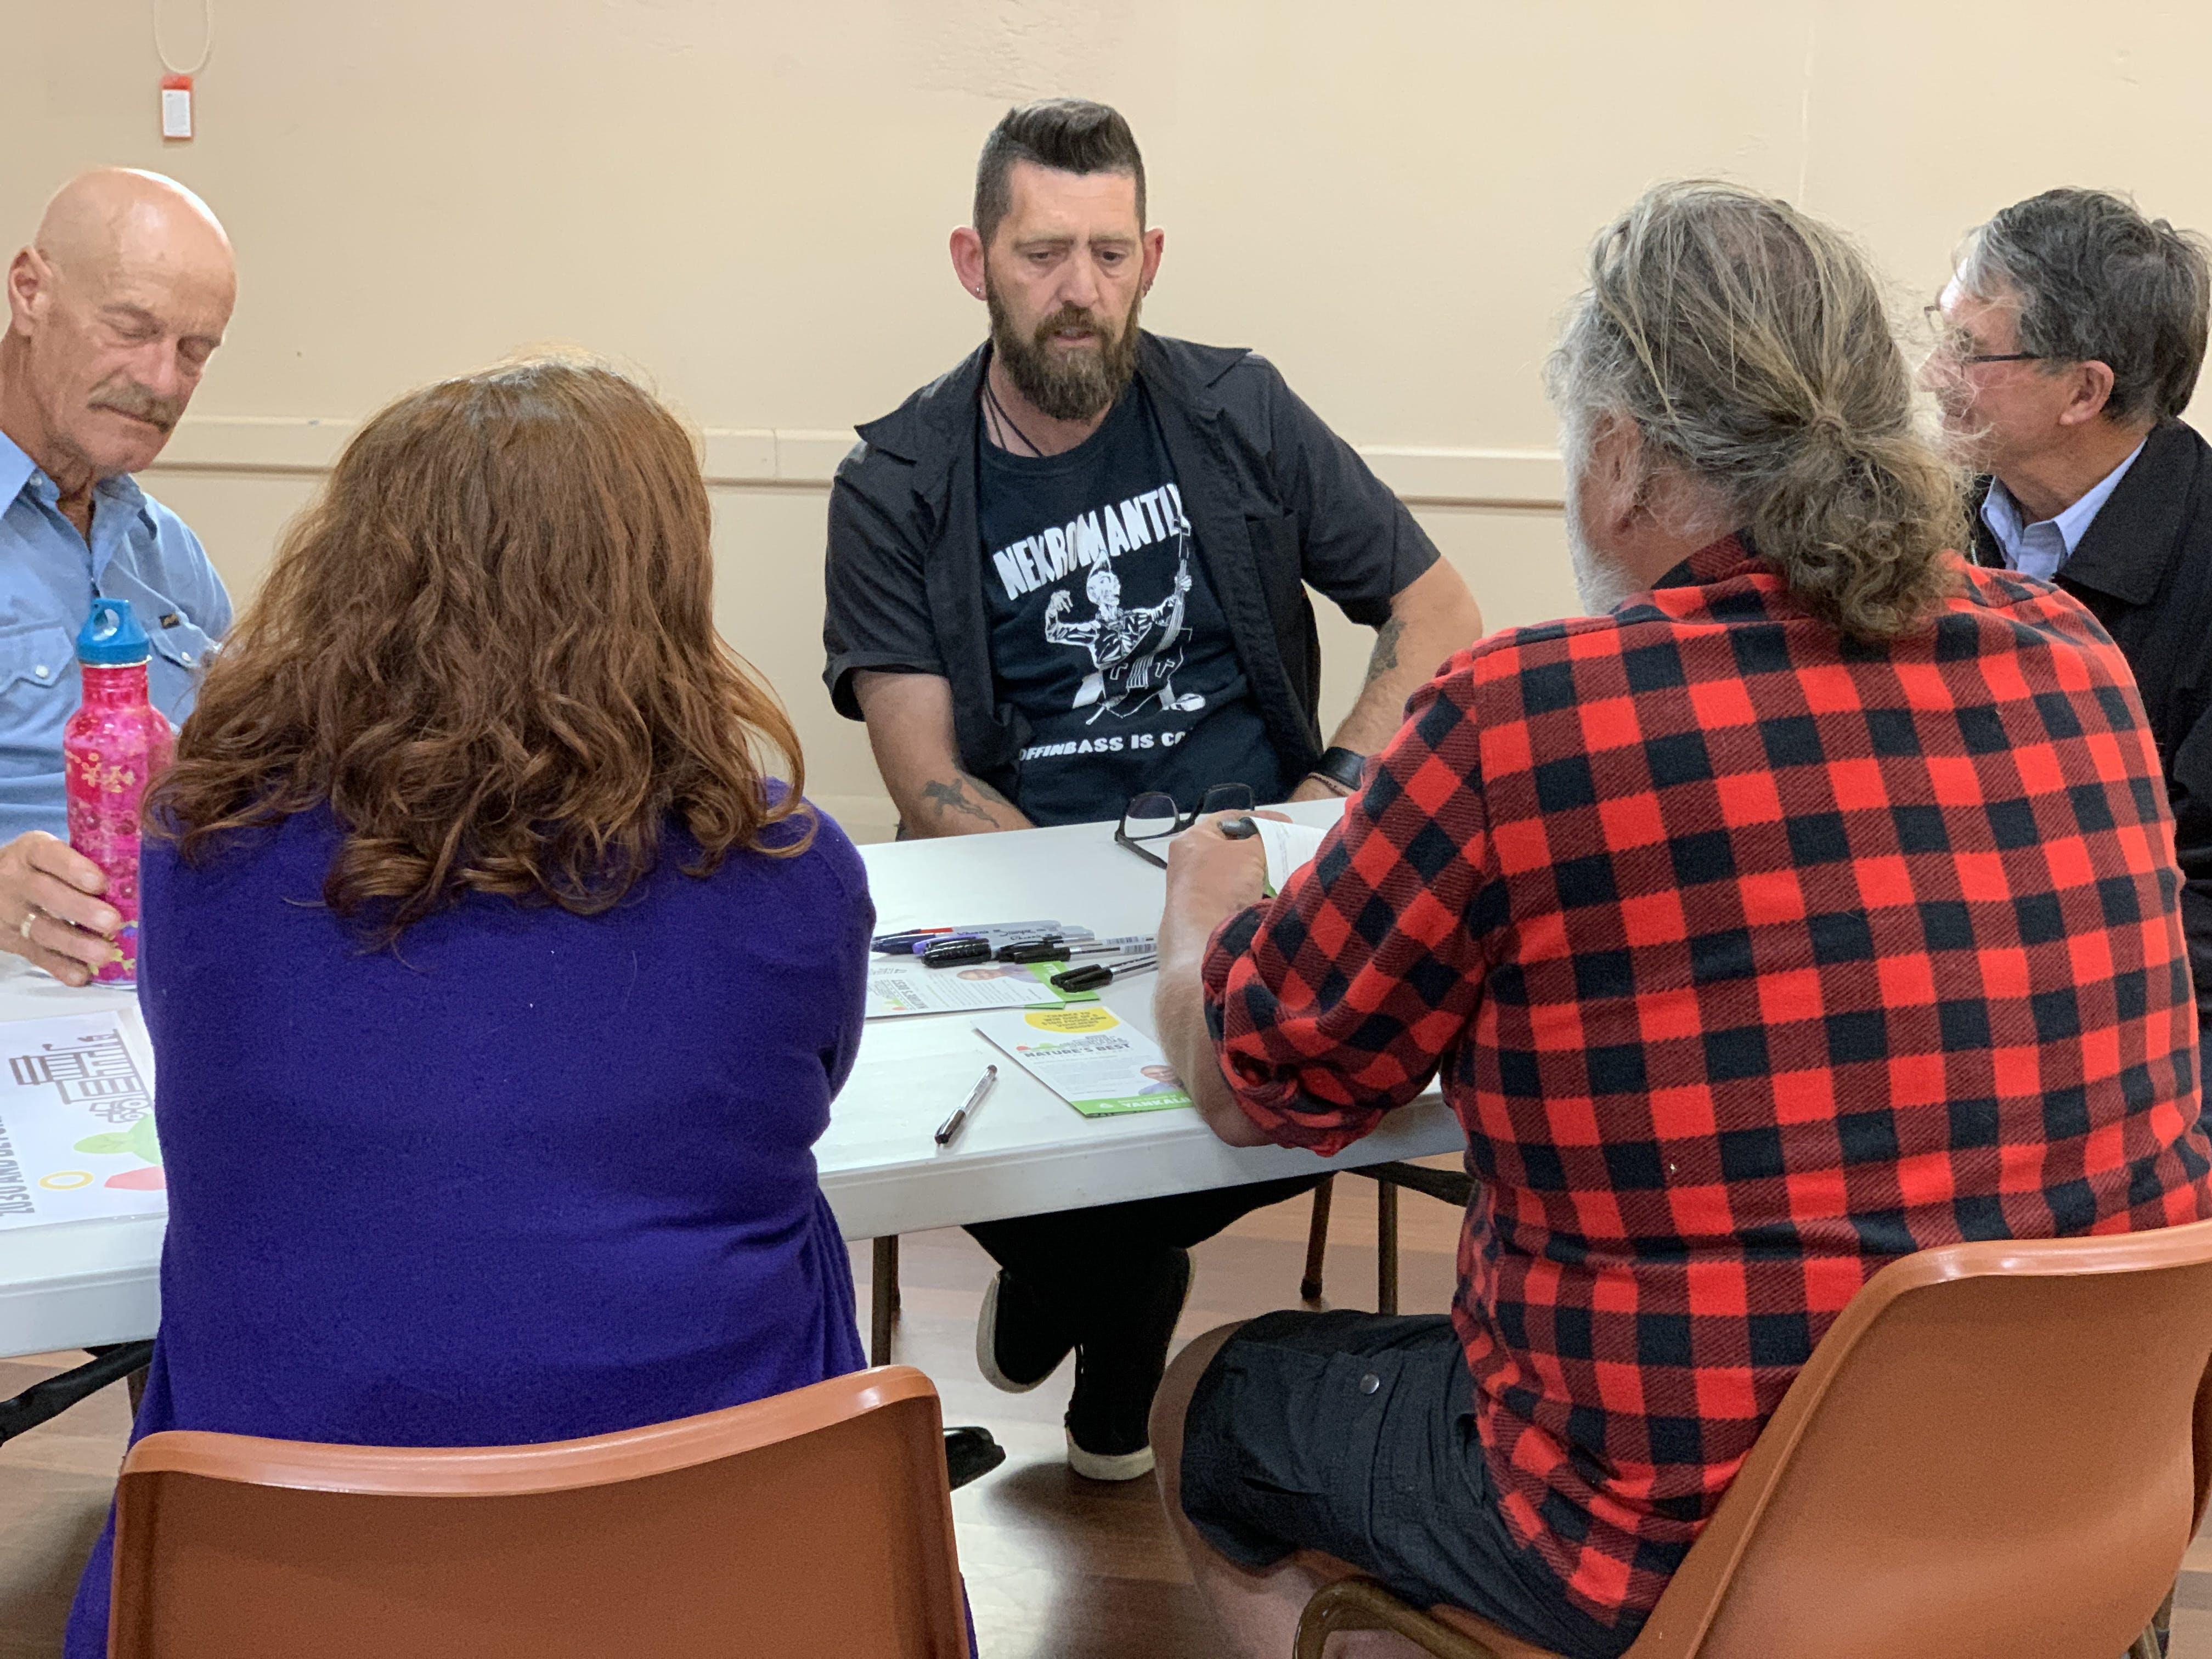 Inman Valley Community Forum